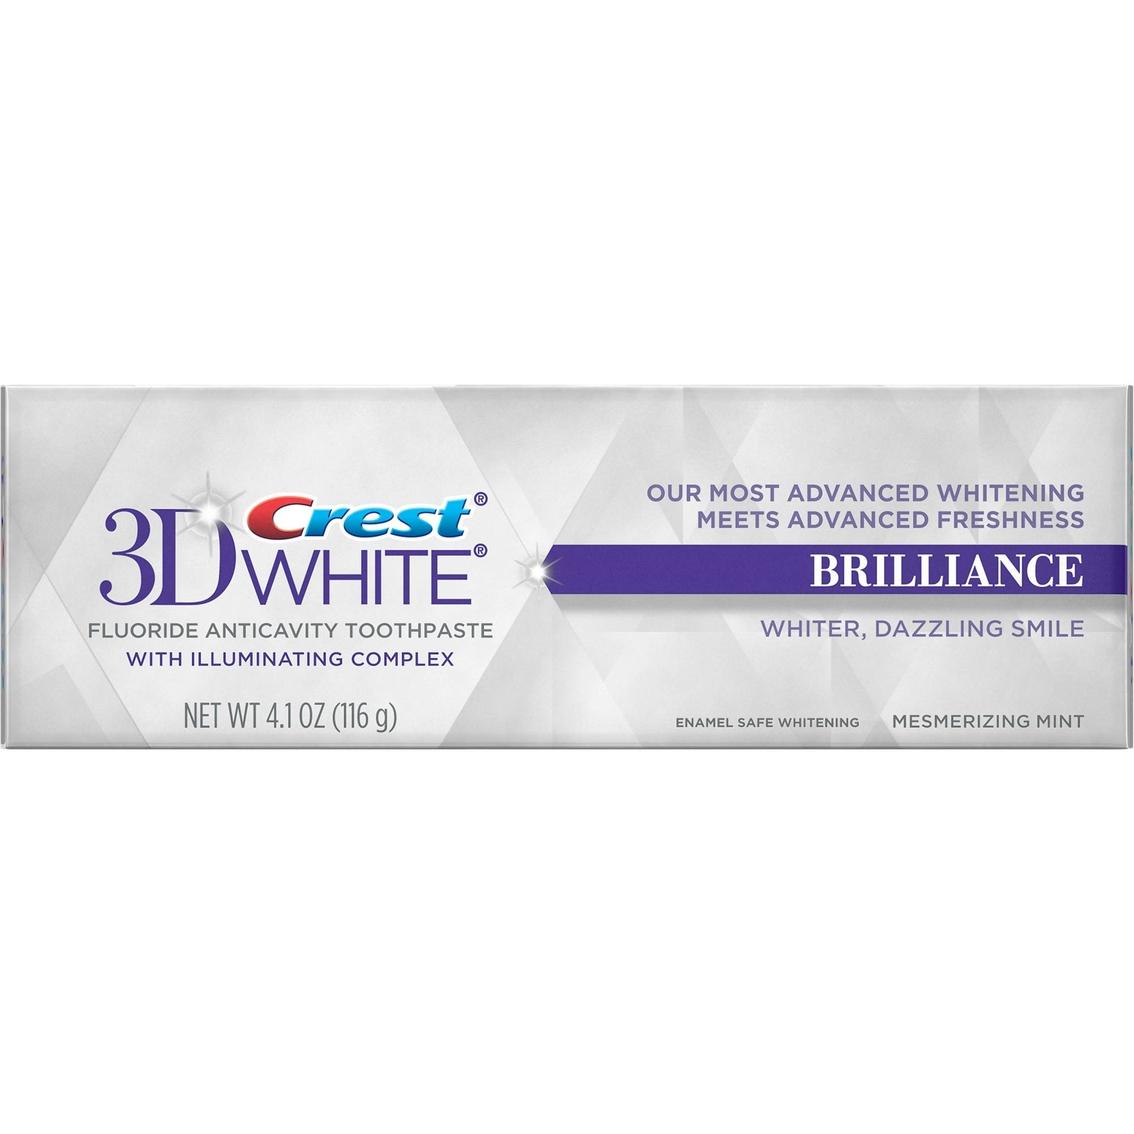 Crest 3d White Brilliance Vibrant Peppermint Whitening Toothpaste